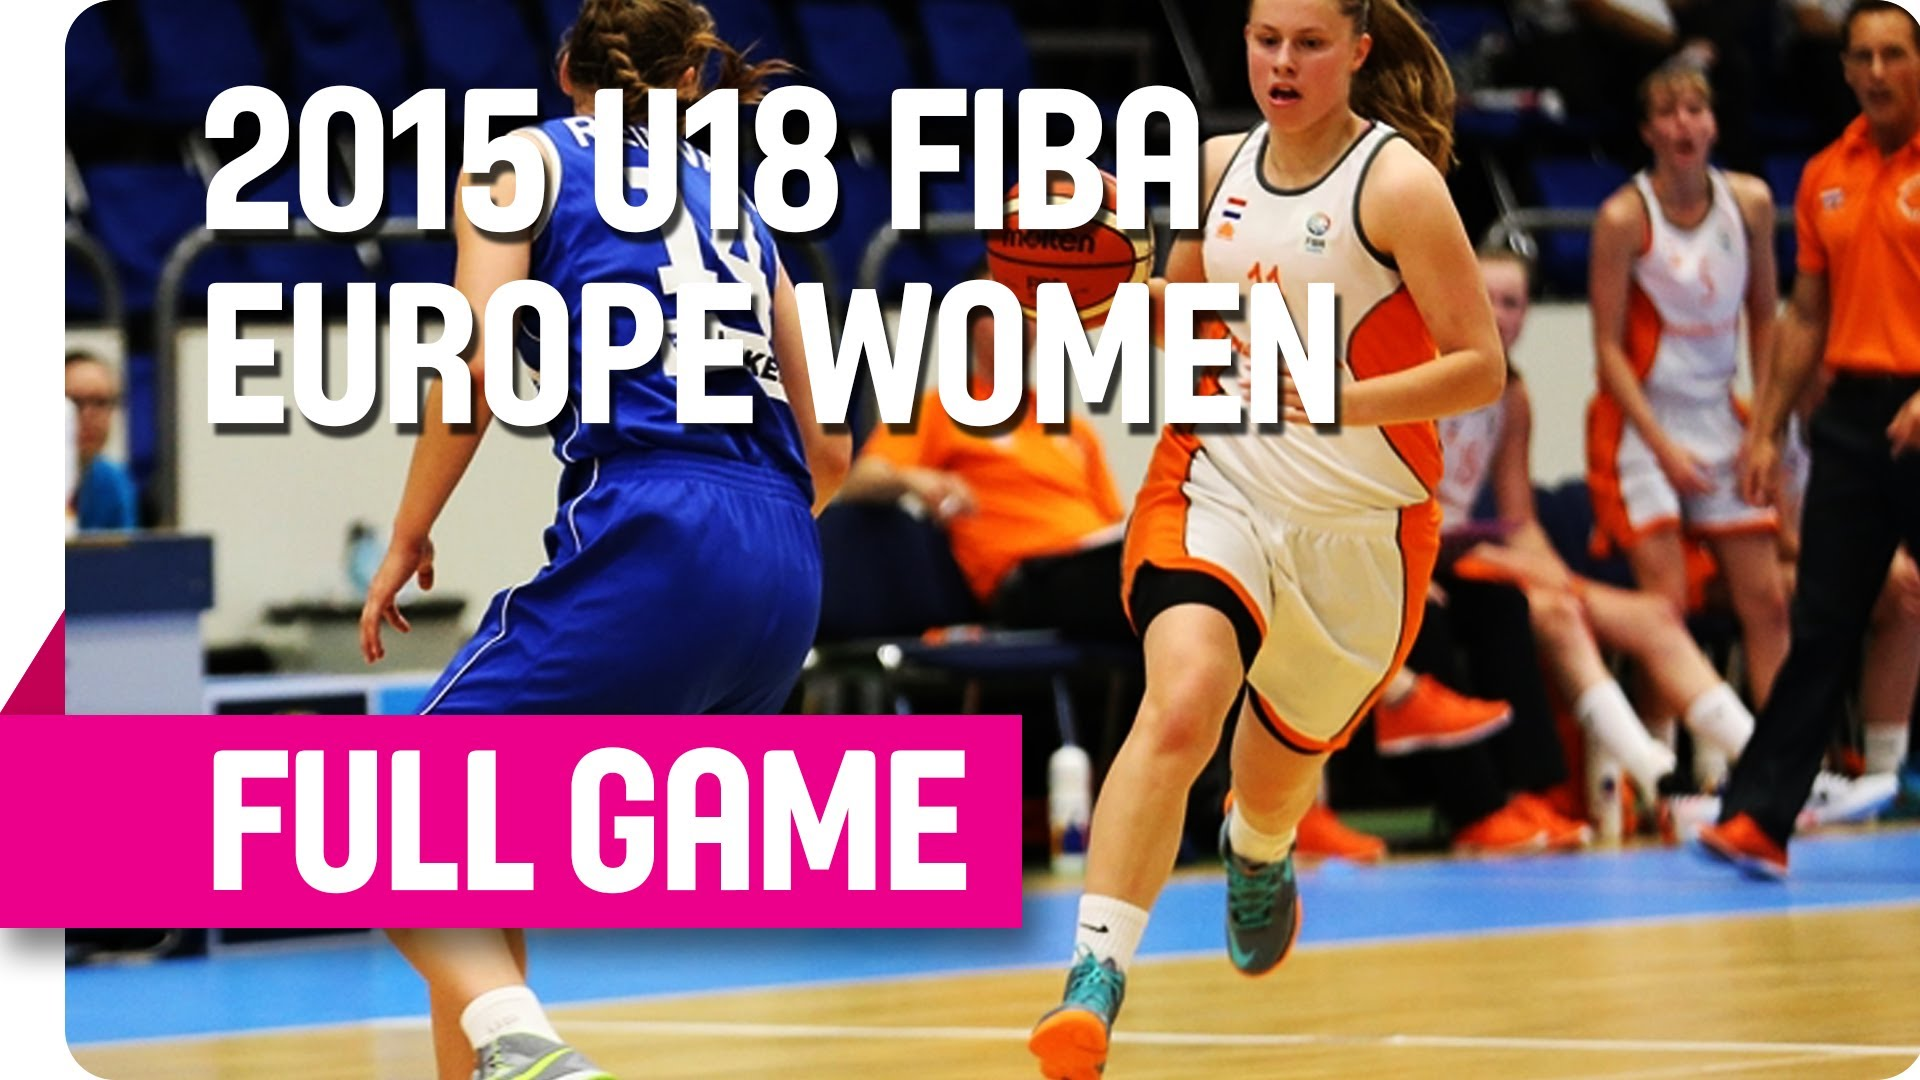 Netherlands v Estonia - Group D - Live Stream - 2015 U18 European Championship Women